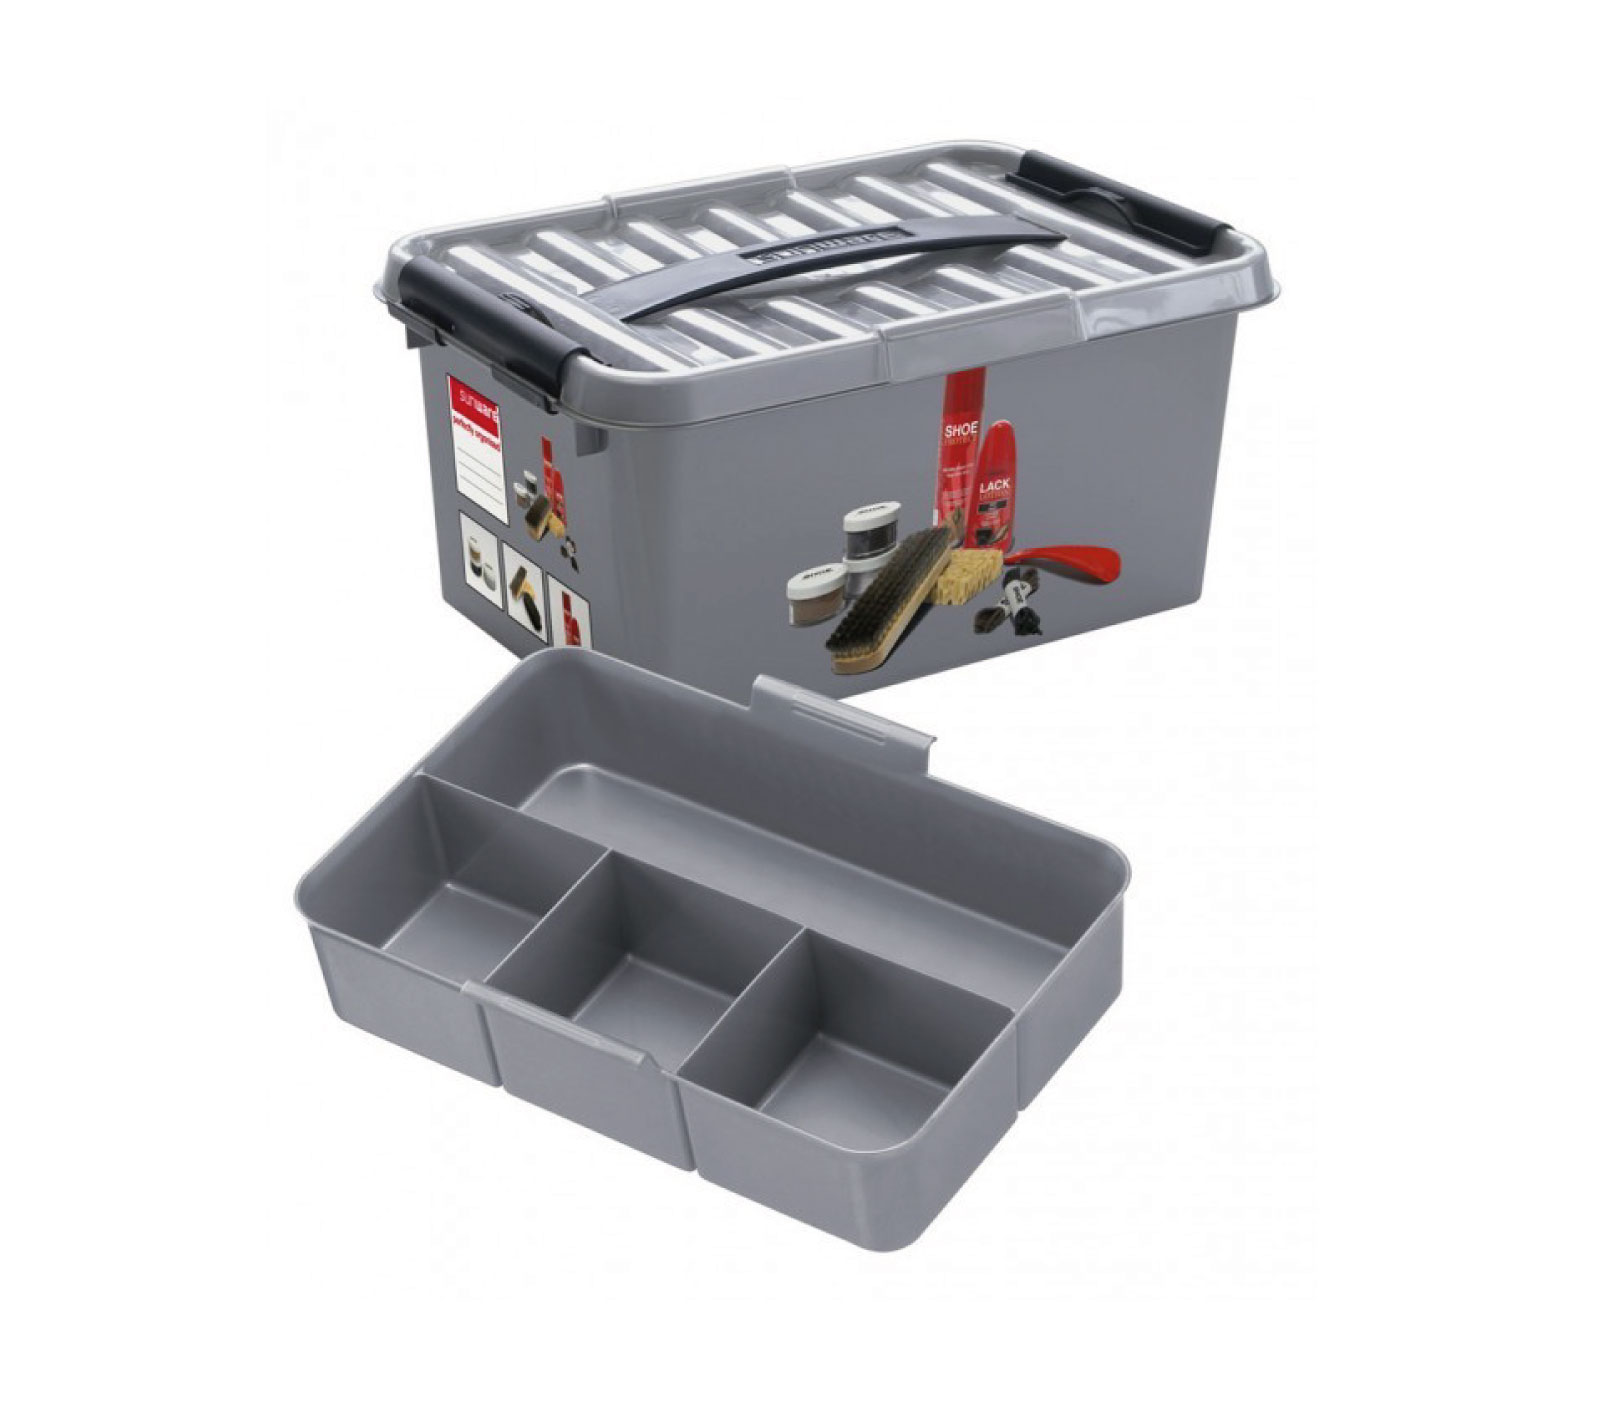 Sunware Q-line Shoepolish Box